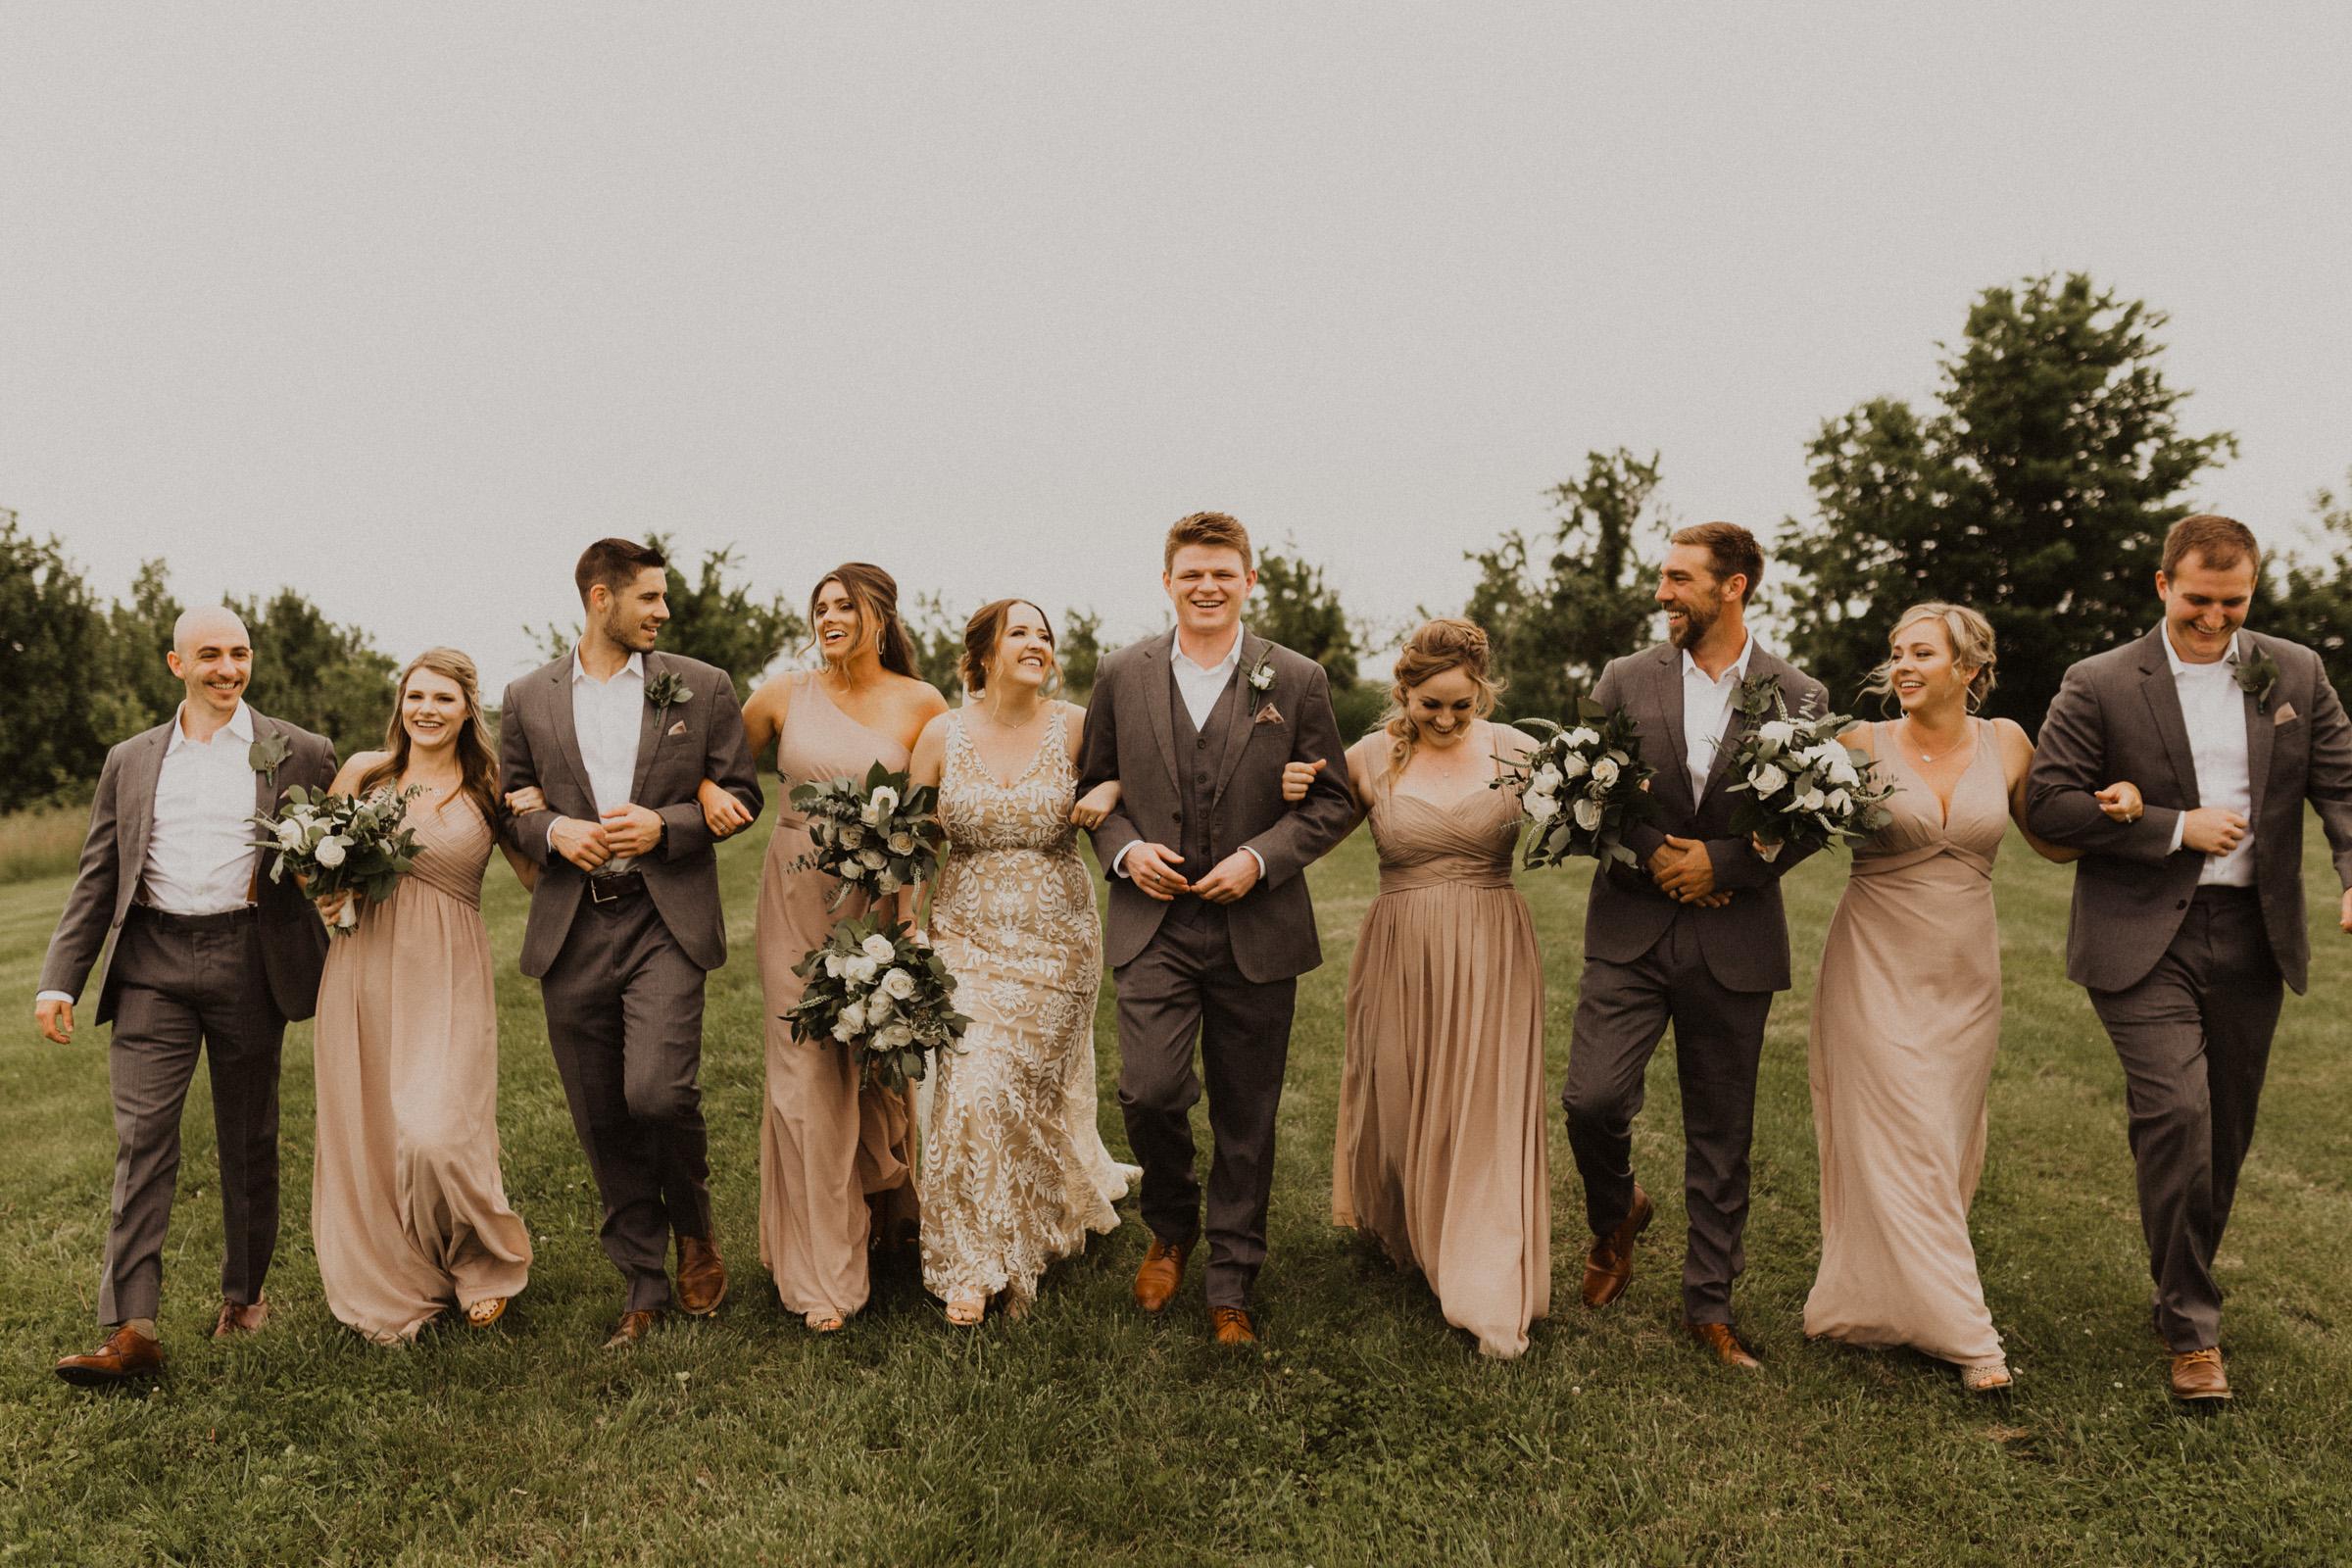 alyssa barletter photography weston red barn farm timberbarn summer outdoor wedding-26.jpg